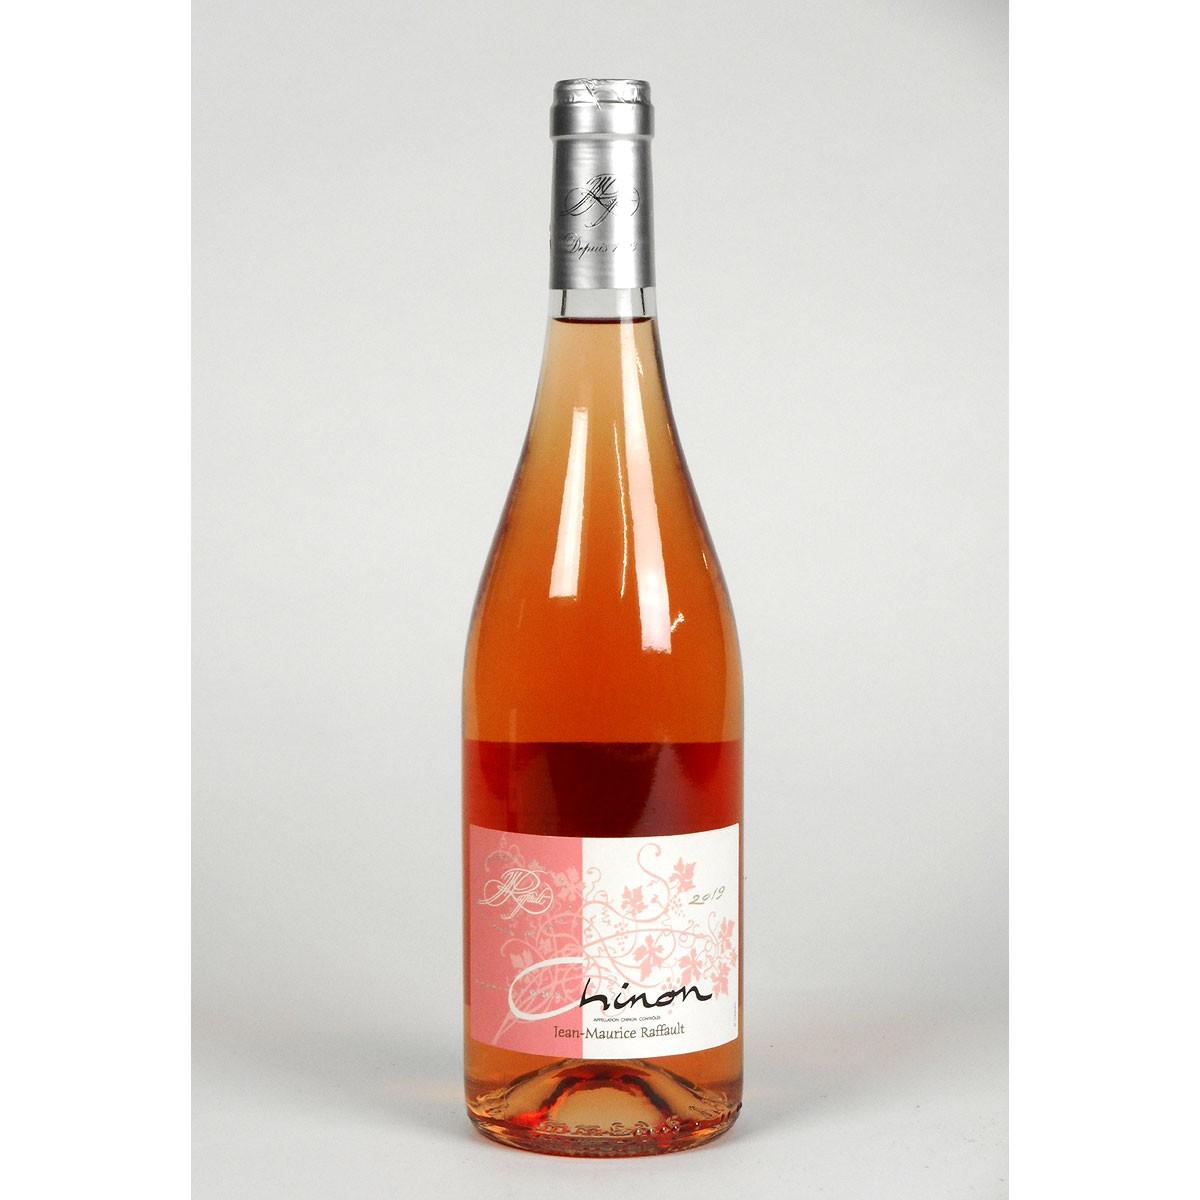 Chinon: Domaine Jean-Maurice Raffault Rosé 2019 - Bottle